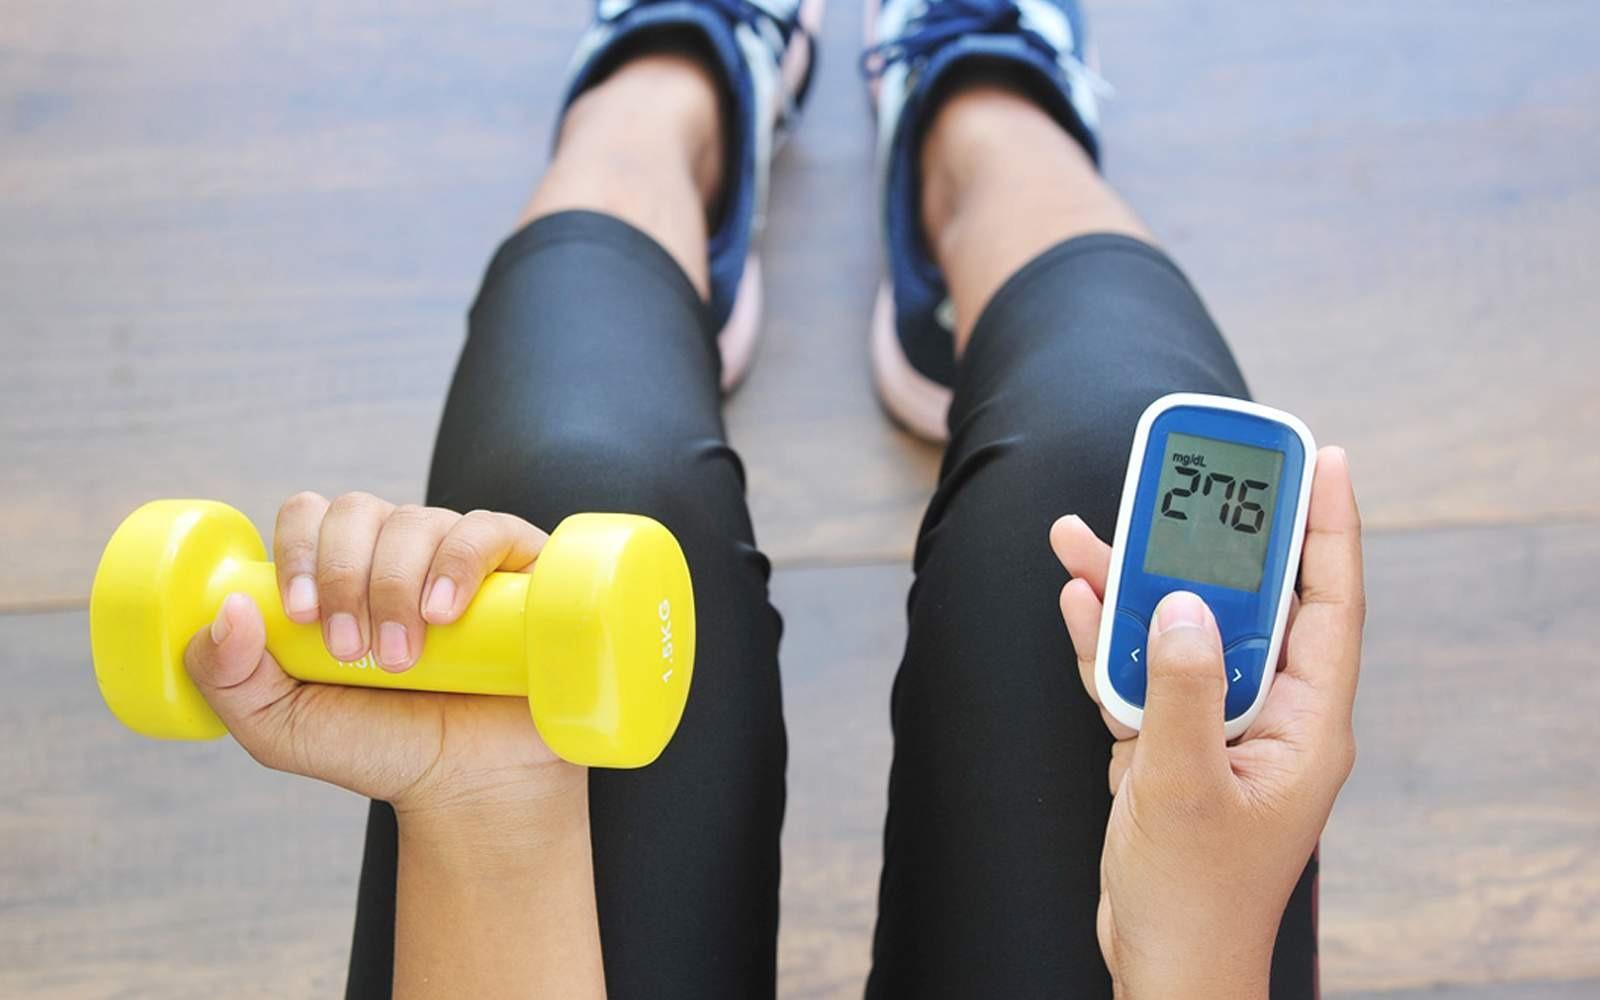 Masuki Normal Baru, Ini Pentingnya Jaga Gula Darah bagi Diabetesi